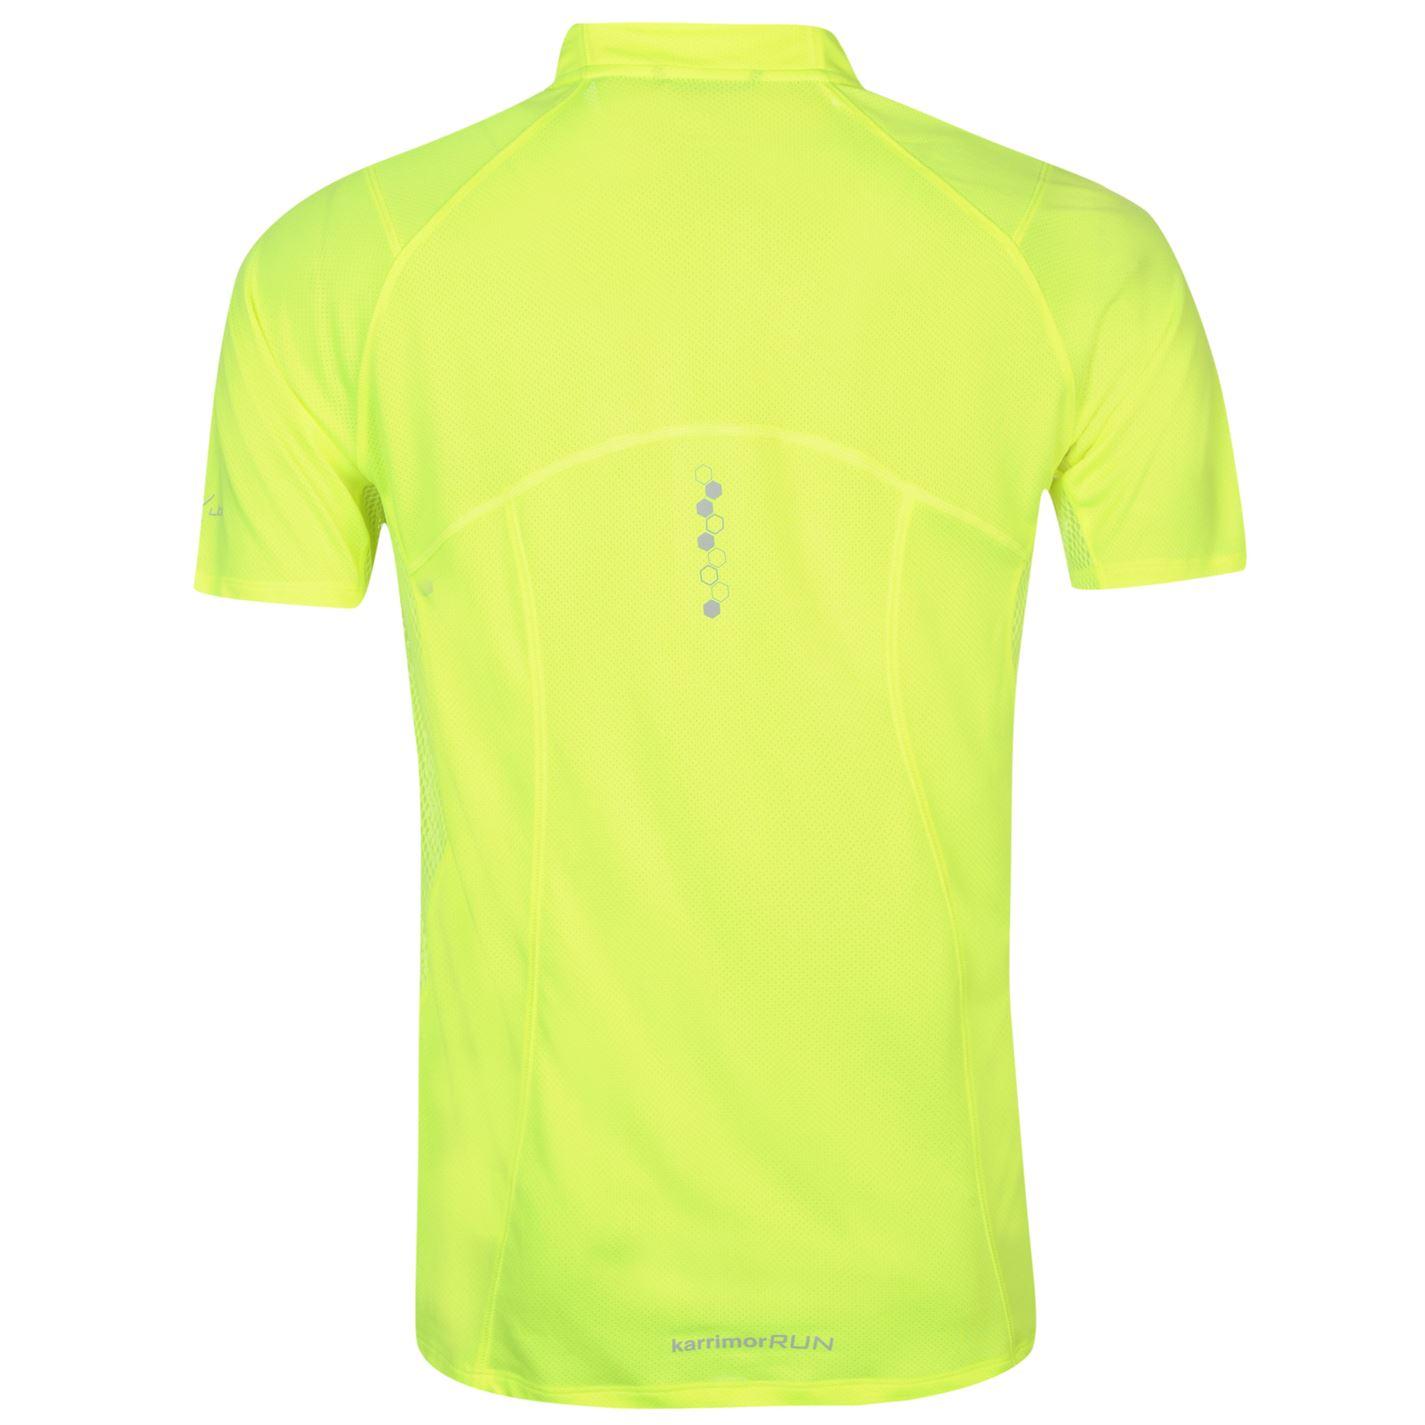 Karrimor-Correr-Mens-X-Cremallera-Camiseta-Camiseta-Top-Transpirable-Ligero-Mentonera miniatura 12